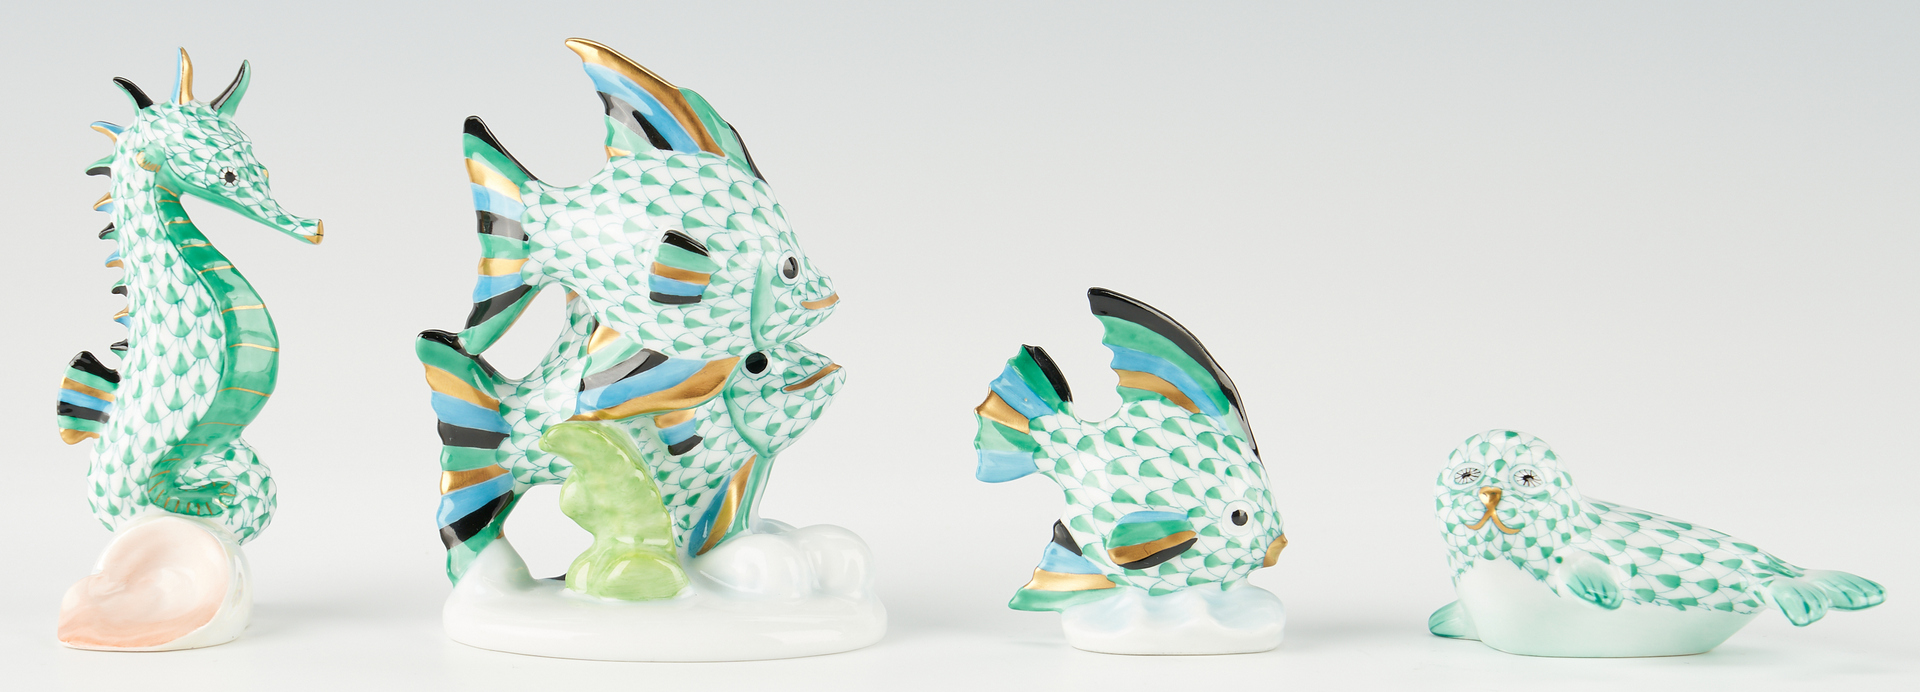 Lot 339: 8 Herend Ocean Animal Figurines, incl. Sea Lion